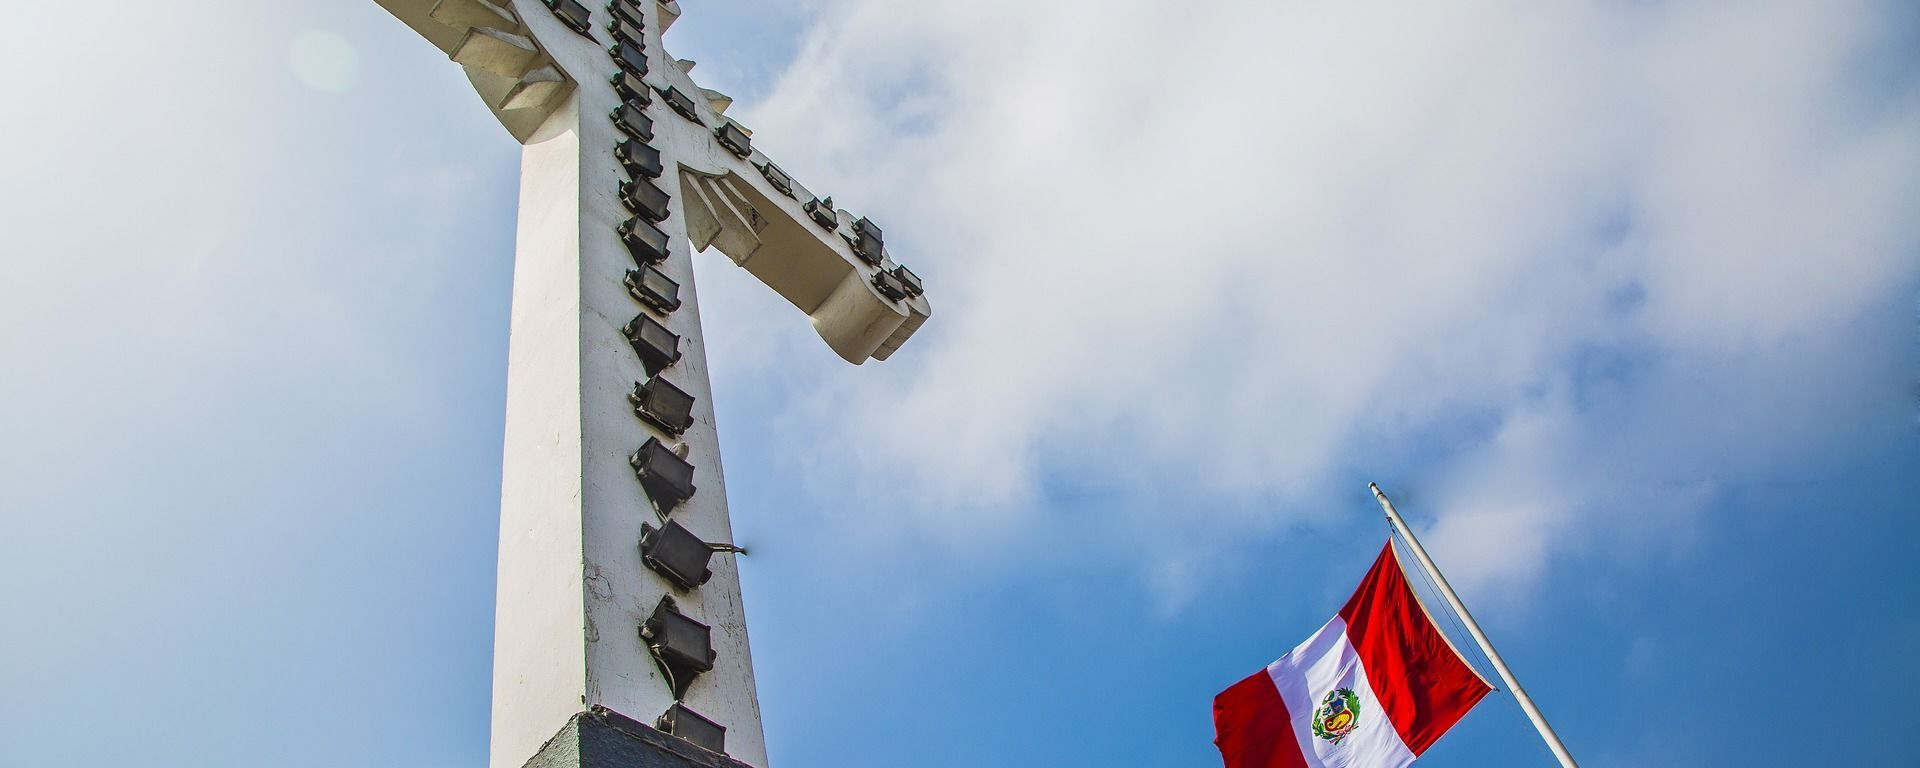 Bandera de Perú (imagen referencial) - Sputnik Mundo, 1920, 24.05.2021